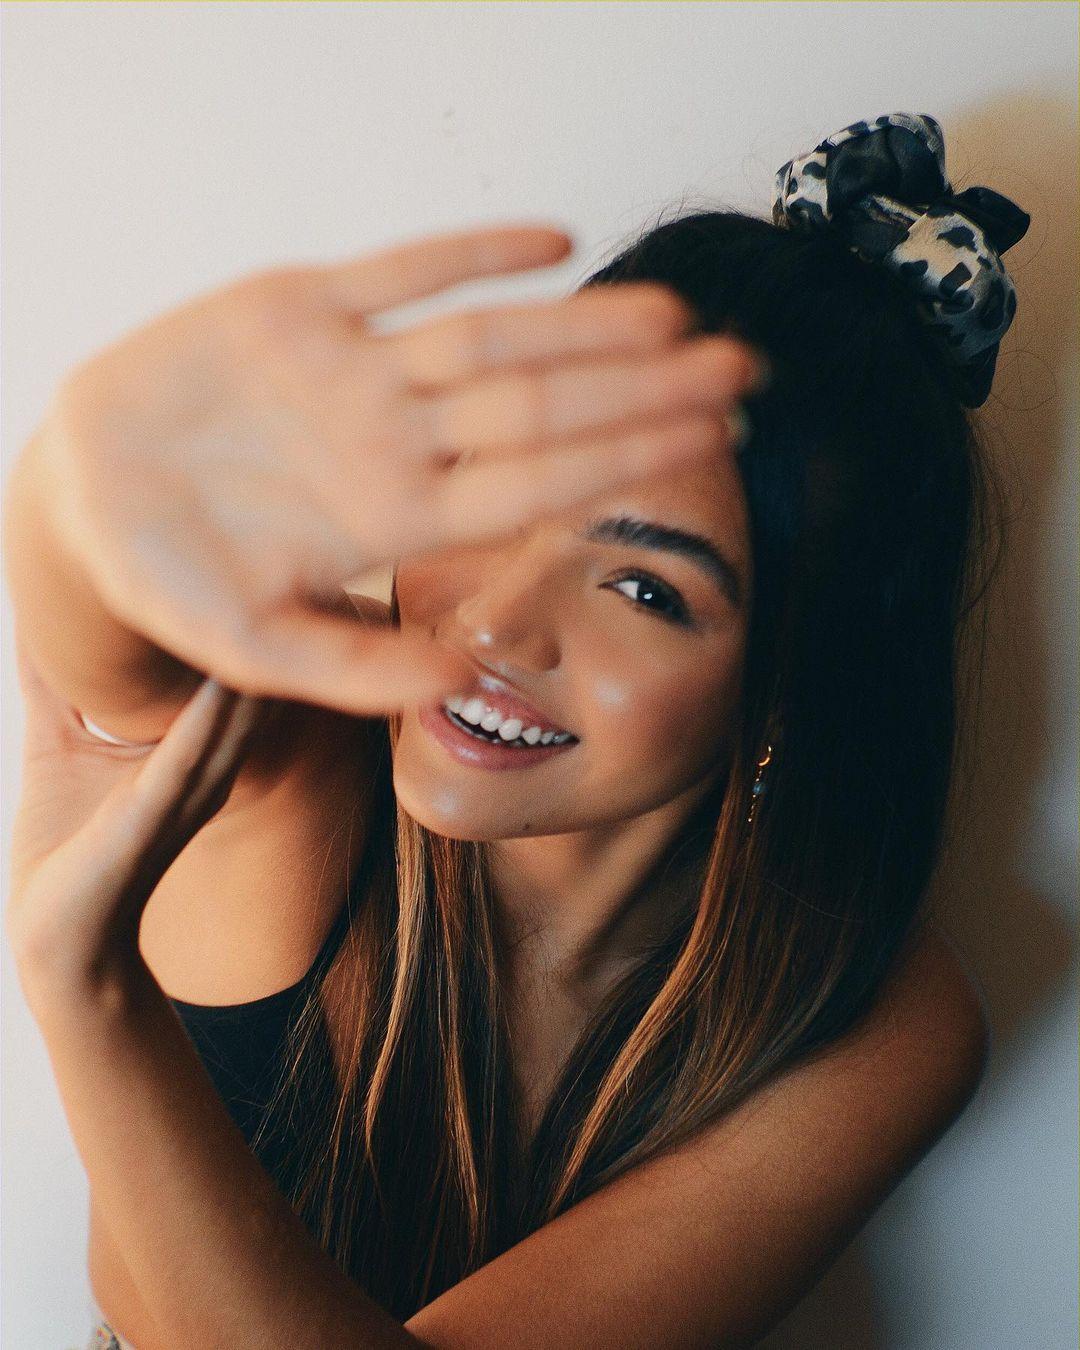 maiza santa rita, top 10 de miss brasil mundo 2019. - Página 2 69152914